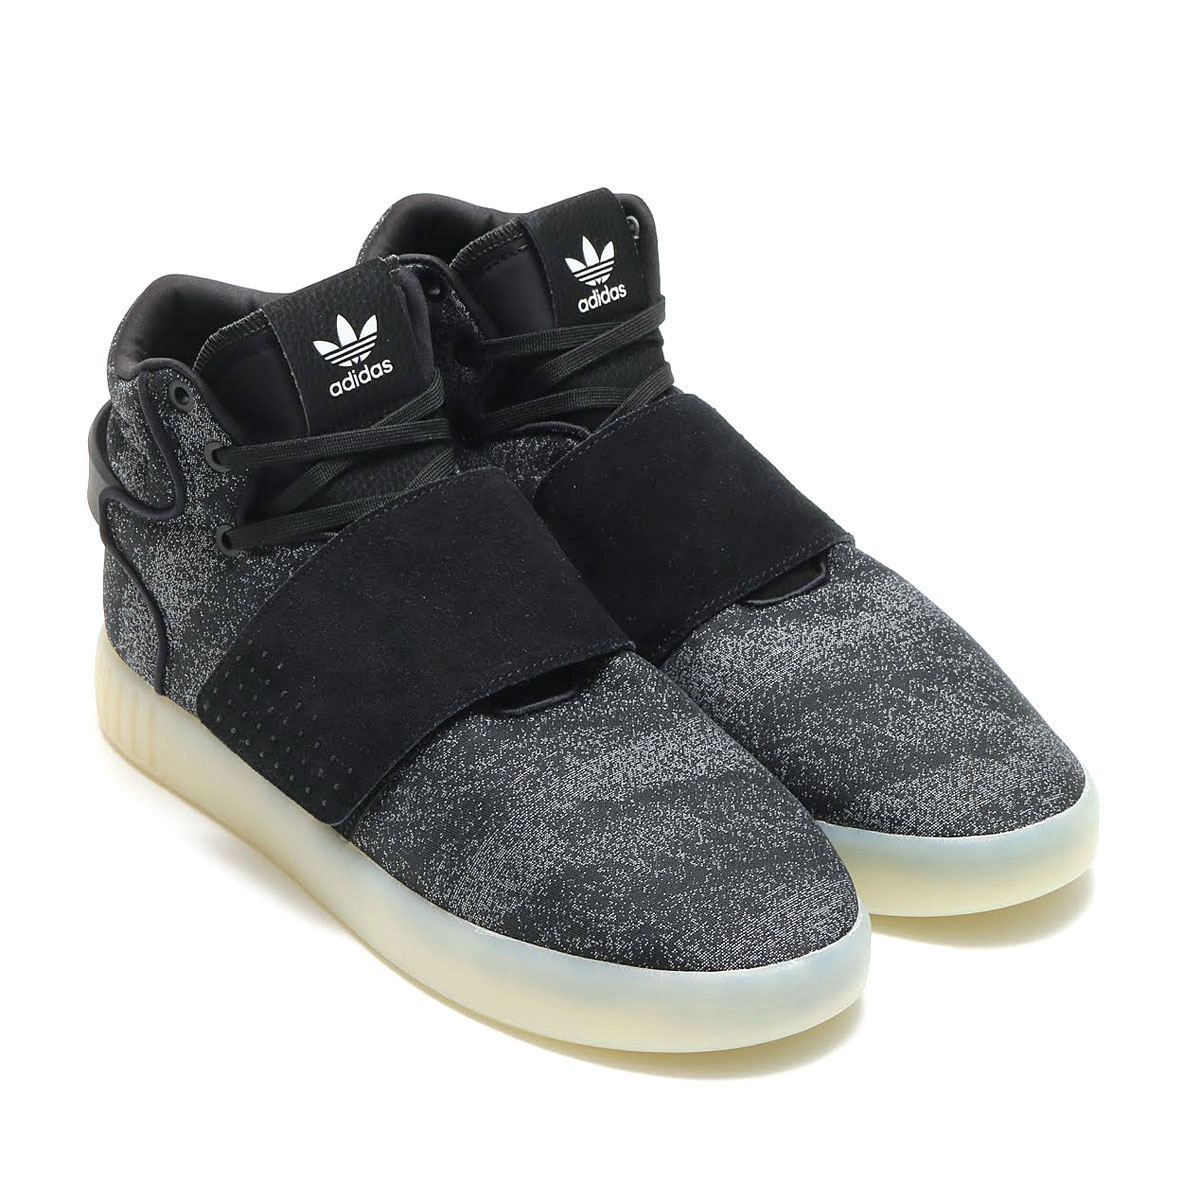 adidas Originals TUBULAR INVADER STRAP JC(アディダス オリジナルス チューブラー インベーダー ストラップ JC)CORE BLACK/CORE BLACK/CRYSTAL WHITE【メンズ スニーカー】17SS-I